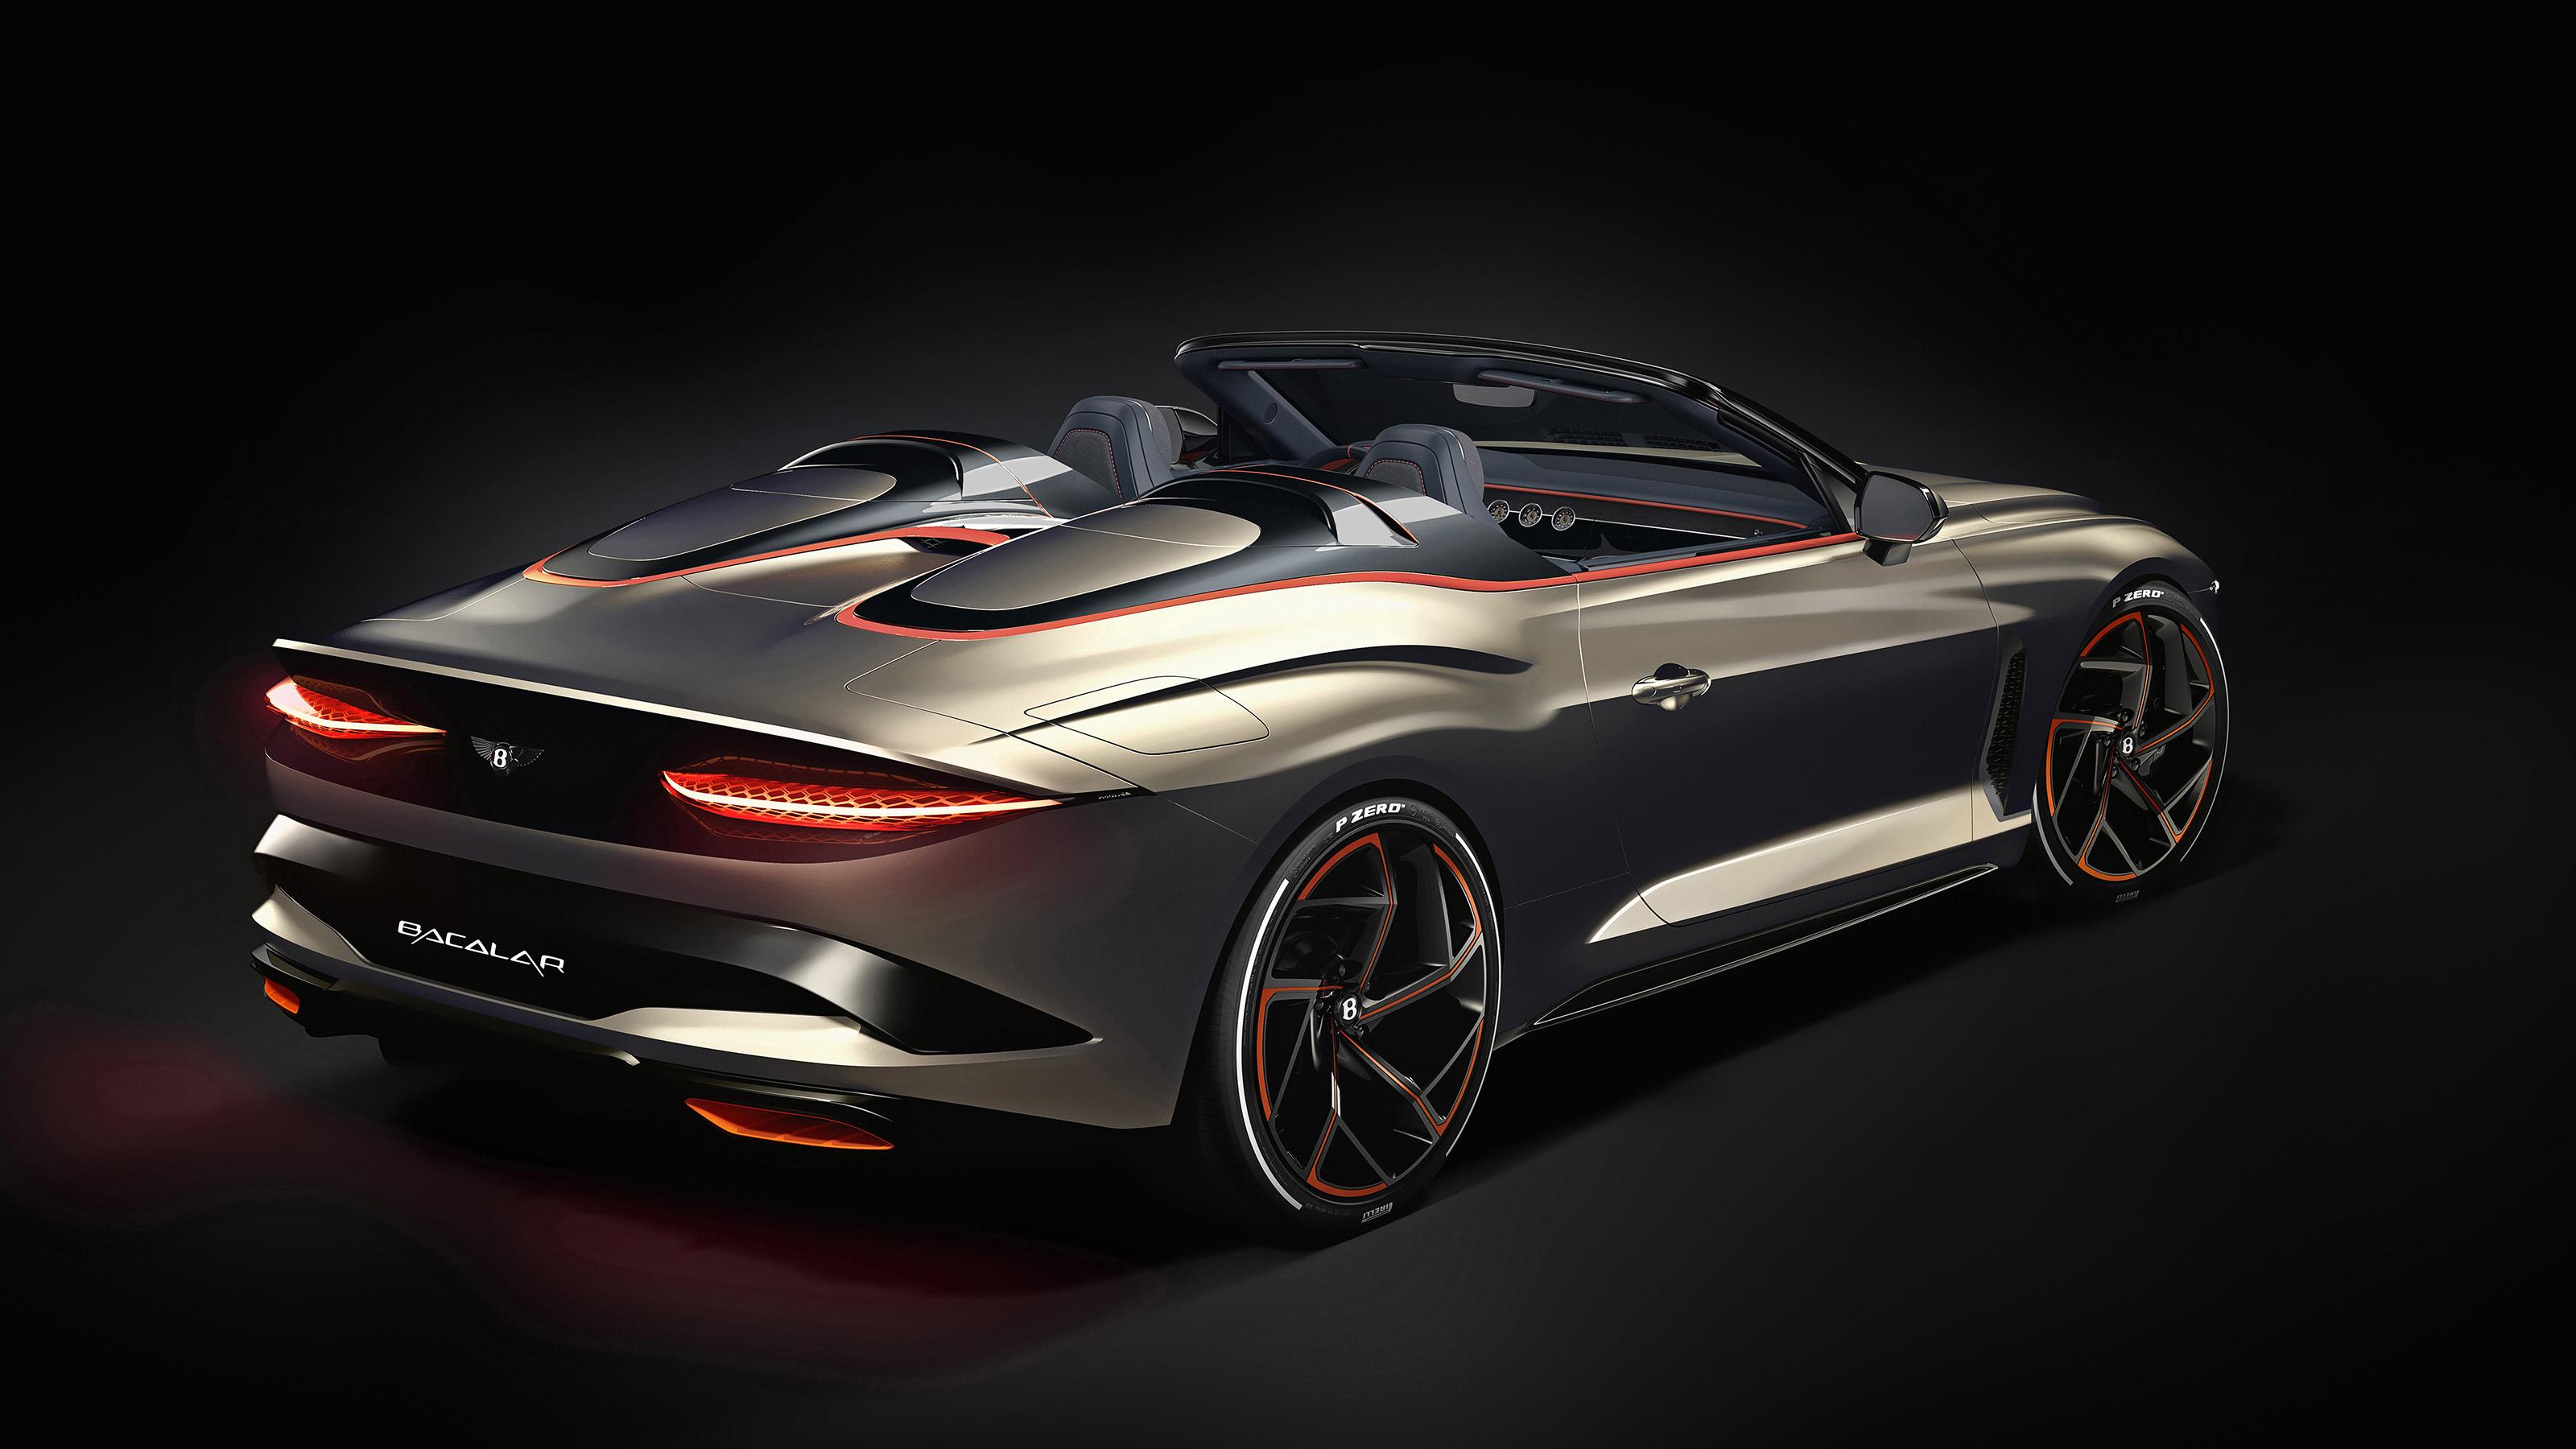 1 5m Bentley Bacalar Revealed In Six New Designs Evo